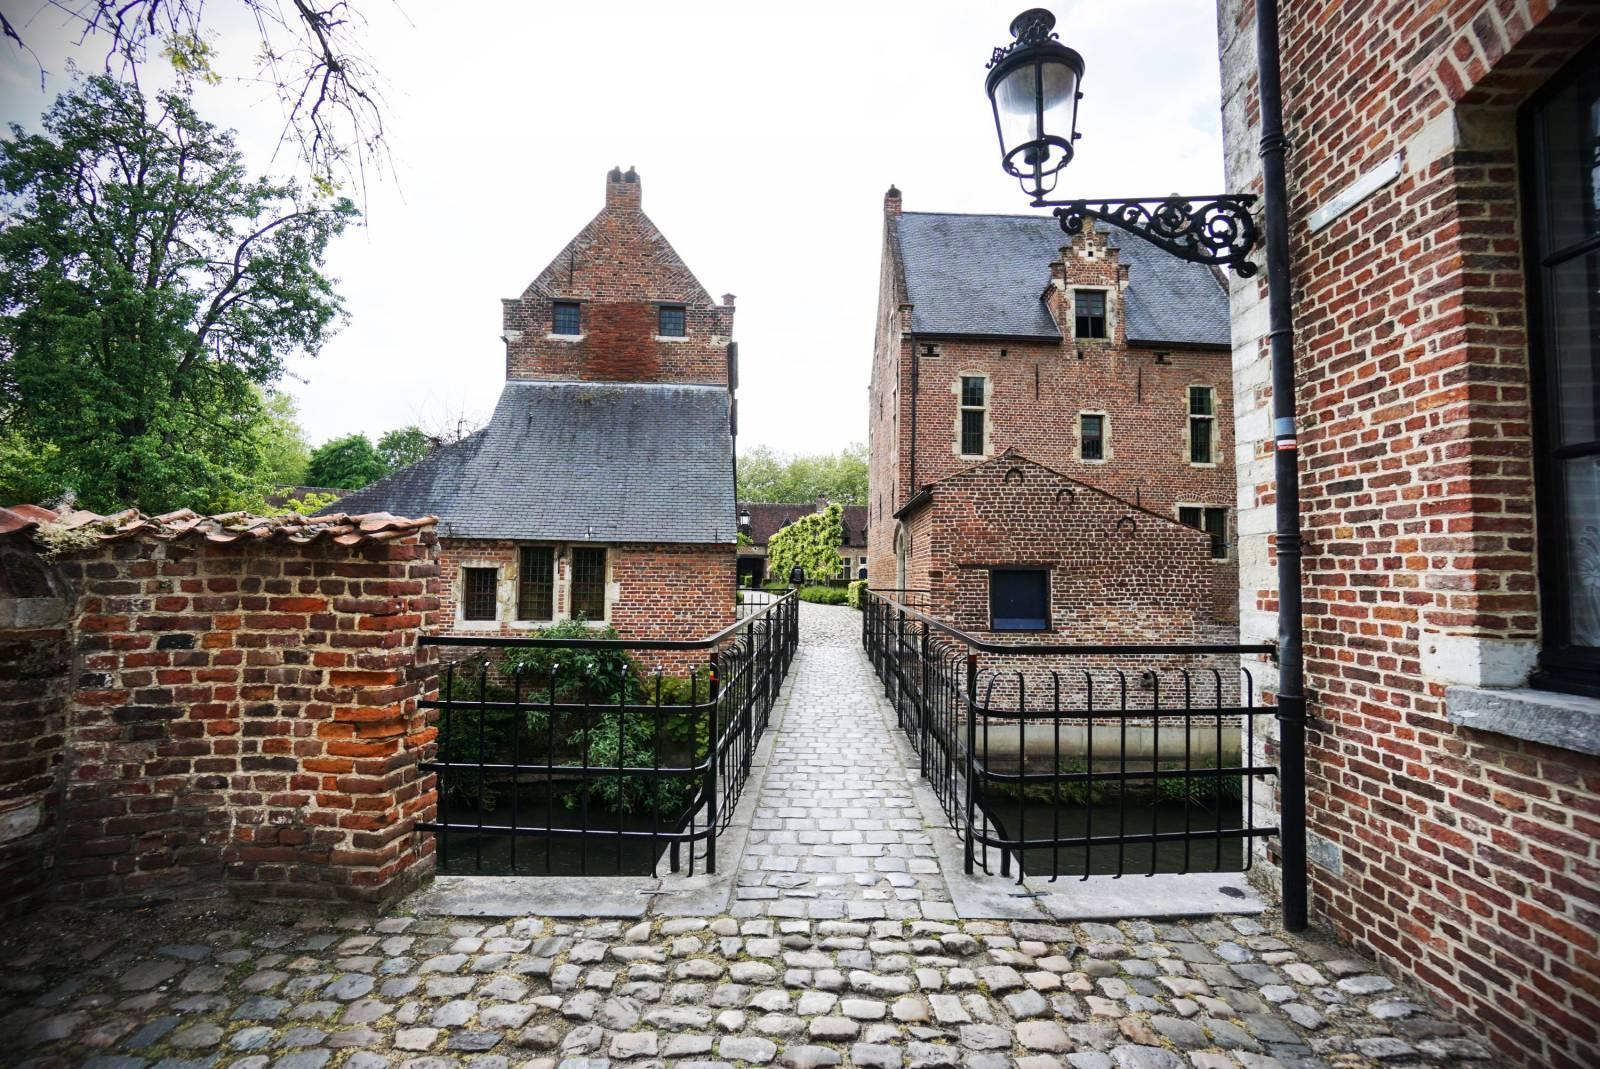 Faculty Club - Feestzaal te Leuven - Eventlocatie - GARDEN LOUNGE MEI 2019 - House of Events - 4